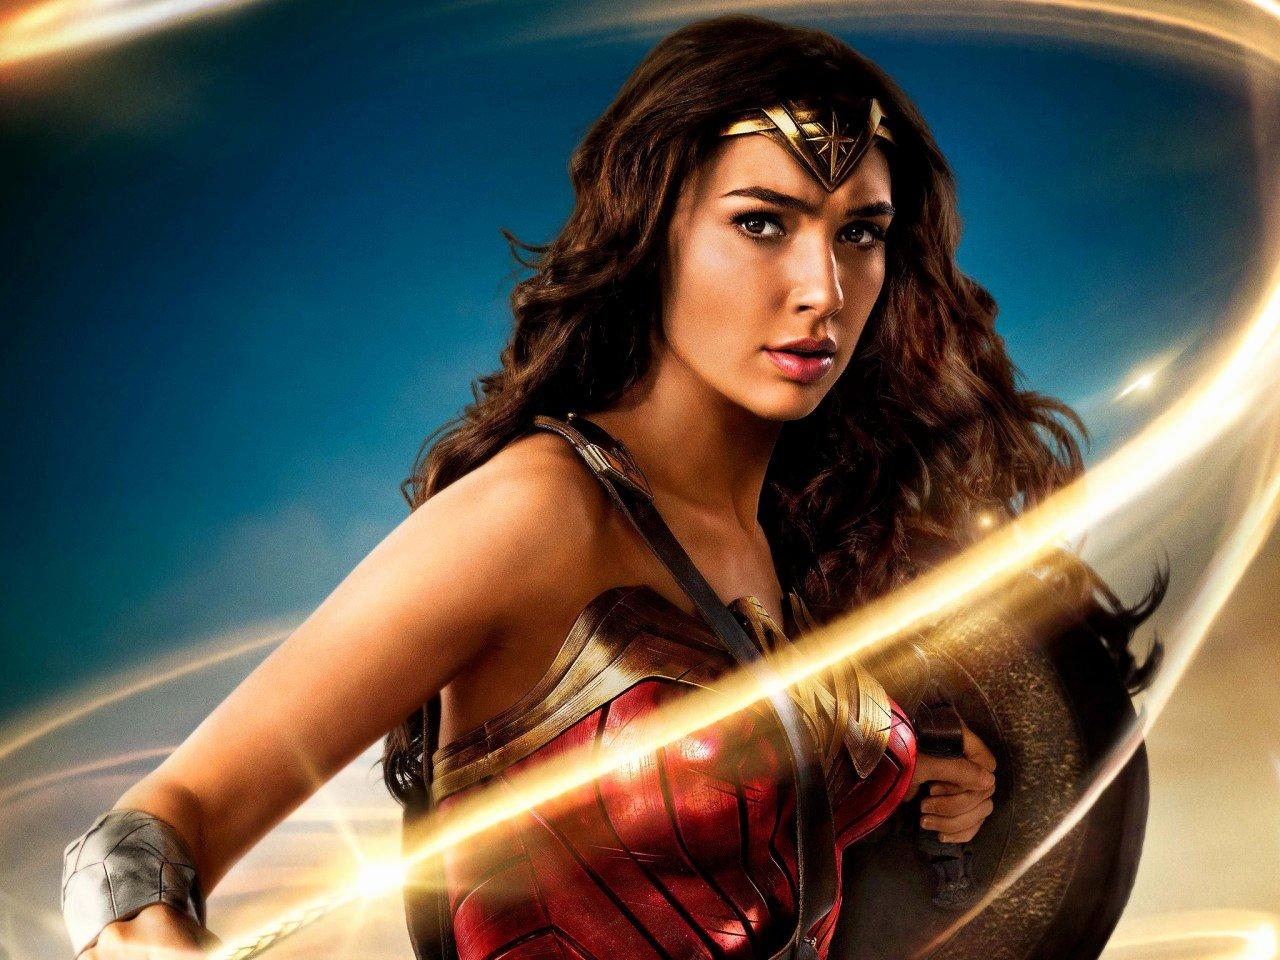 Pics Of Sexy Women Beautiful Gal Gadot Wonder Woman 2017 Hd Wallpapers